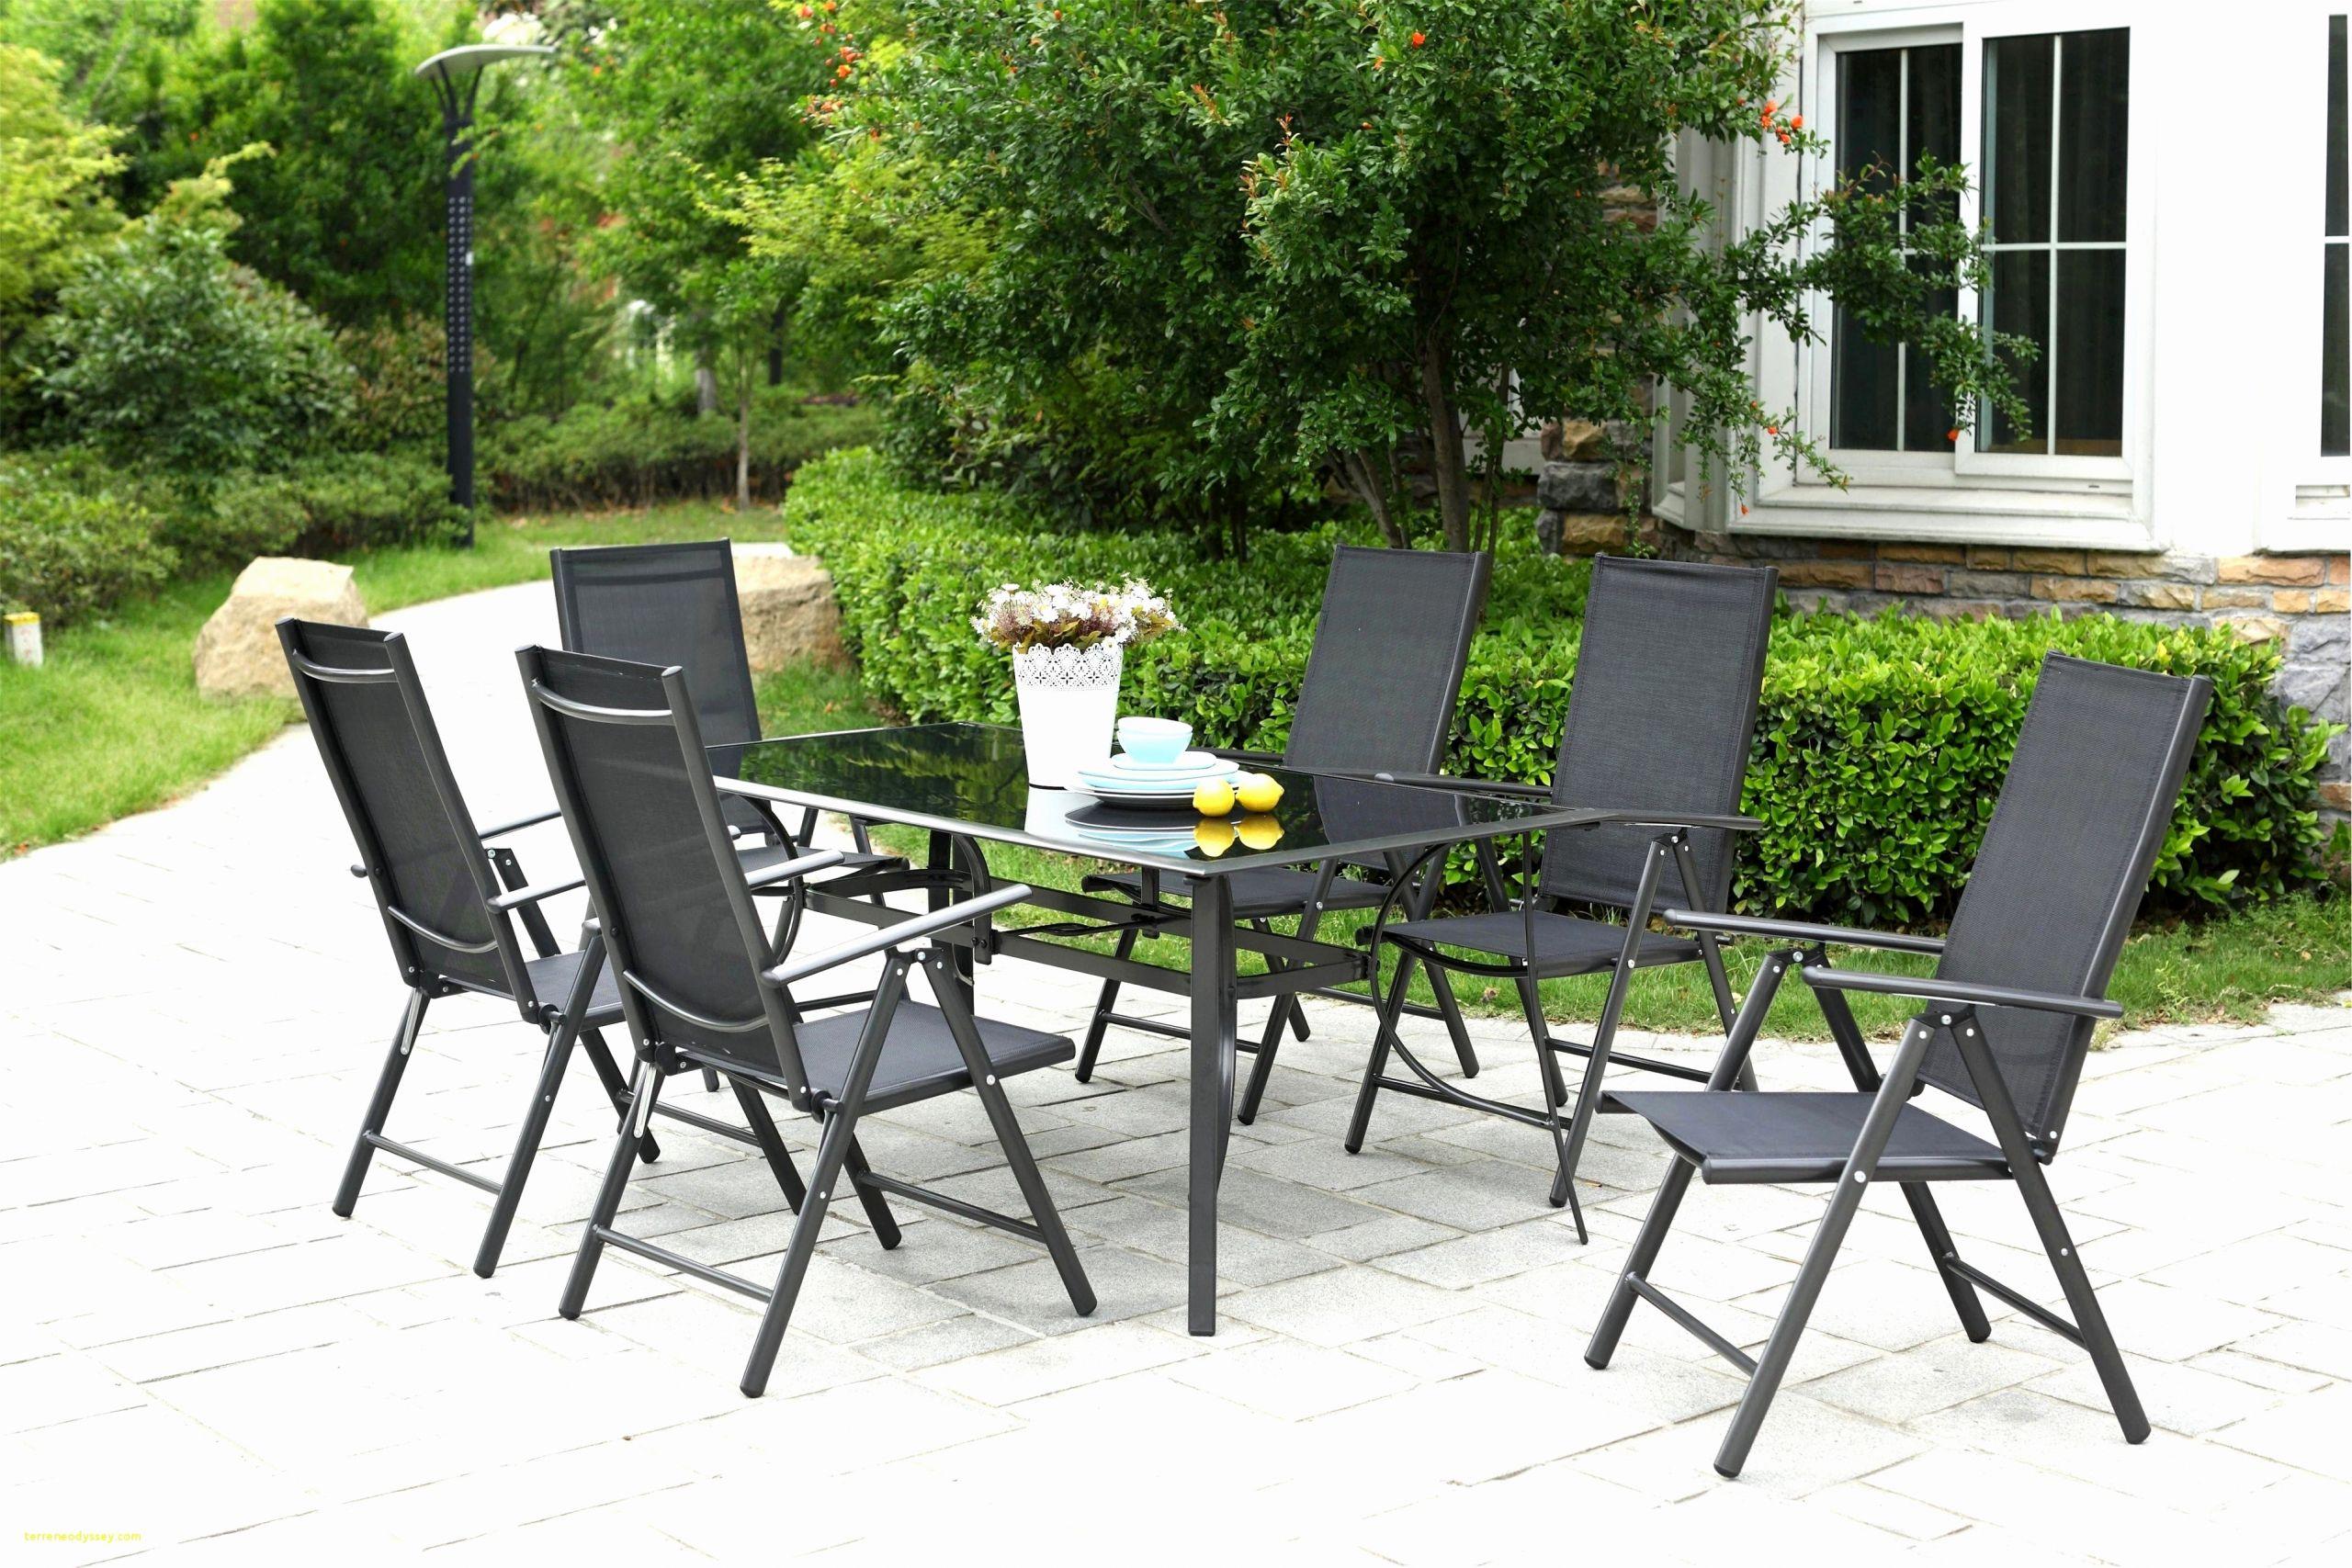 inspirant des photos de cdiscount salon de jardin resine genial cdiscount mobilier de jardin awesome cdiscount meuble salon porte de of inspirant des photos de cdiscount salon de jardin resi